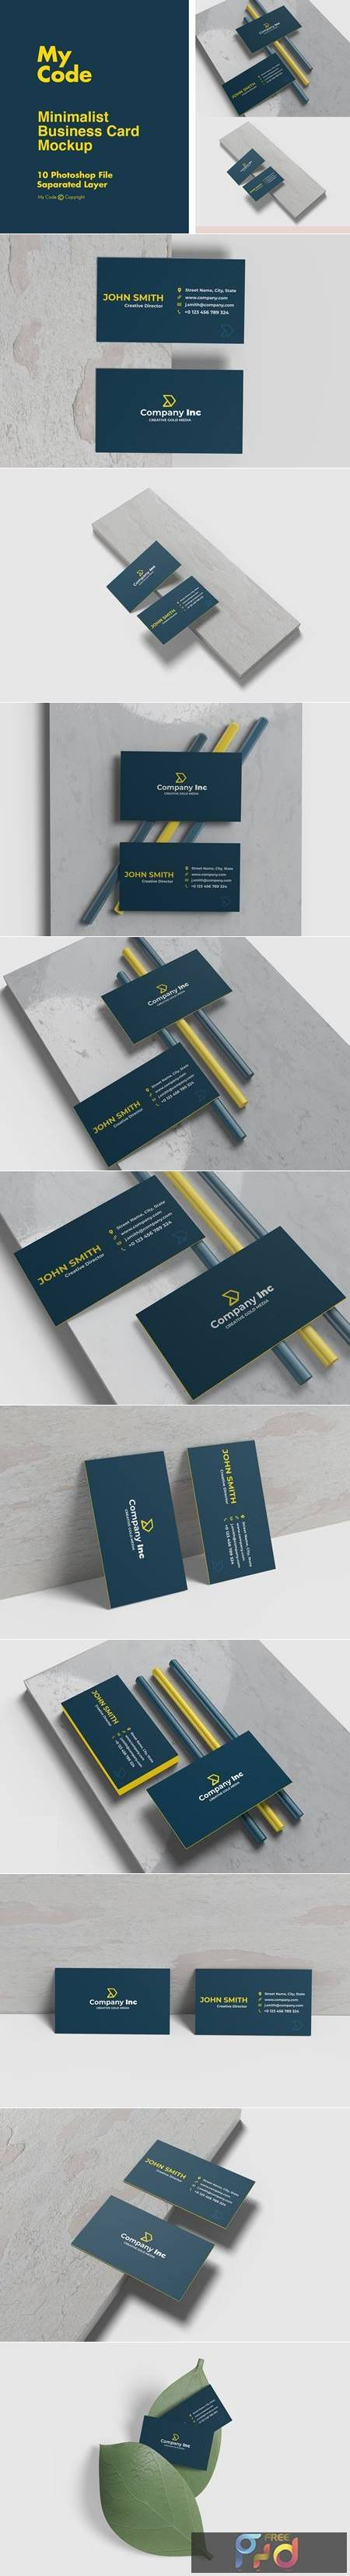 Minimalist Business Card Mockup 4924317 1